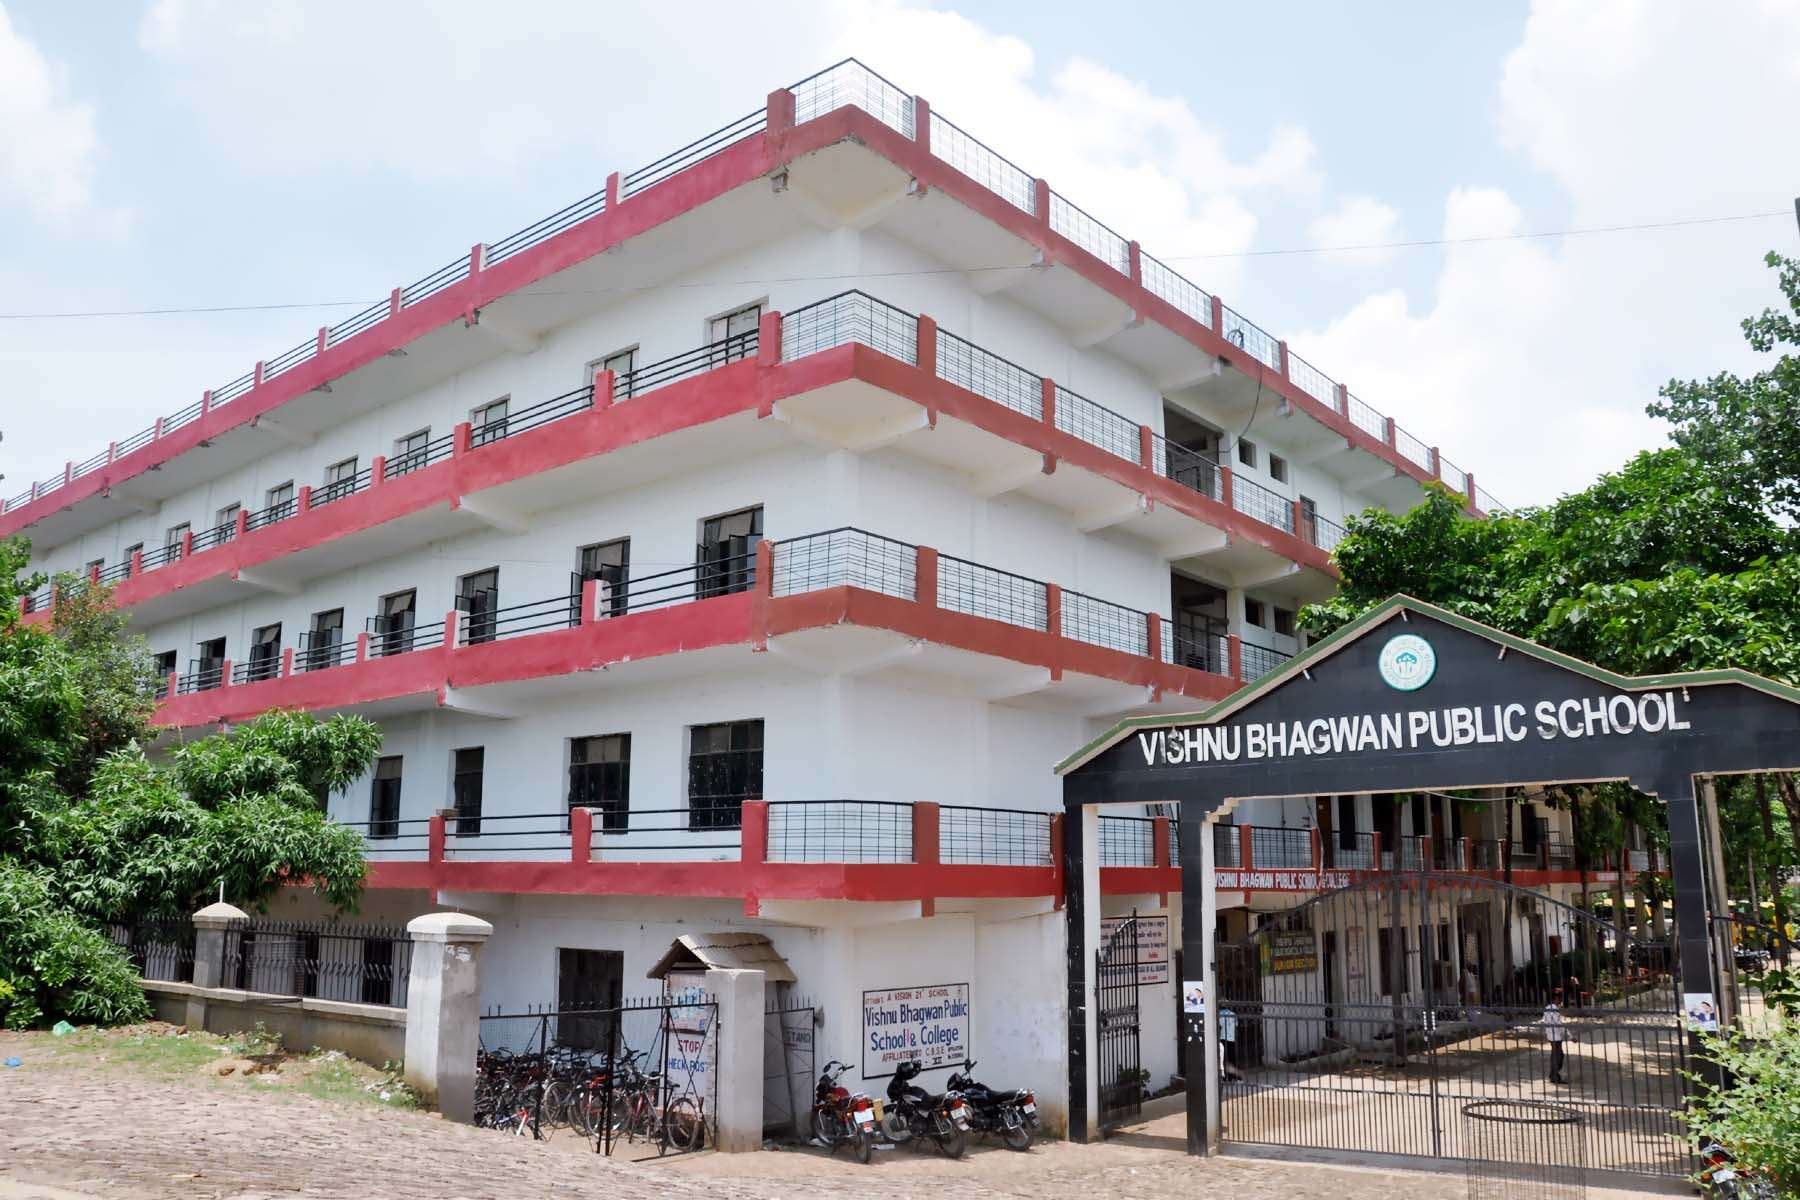 VISHNU BHAGWAN PUBLIC SCHOOL JHALWA PIPALGAON ALLAHABAD UP 2130804